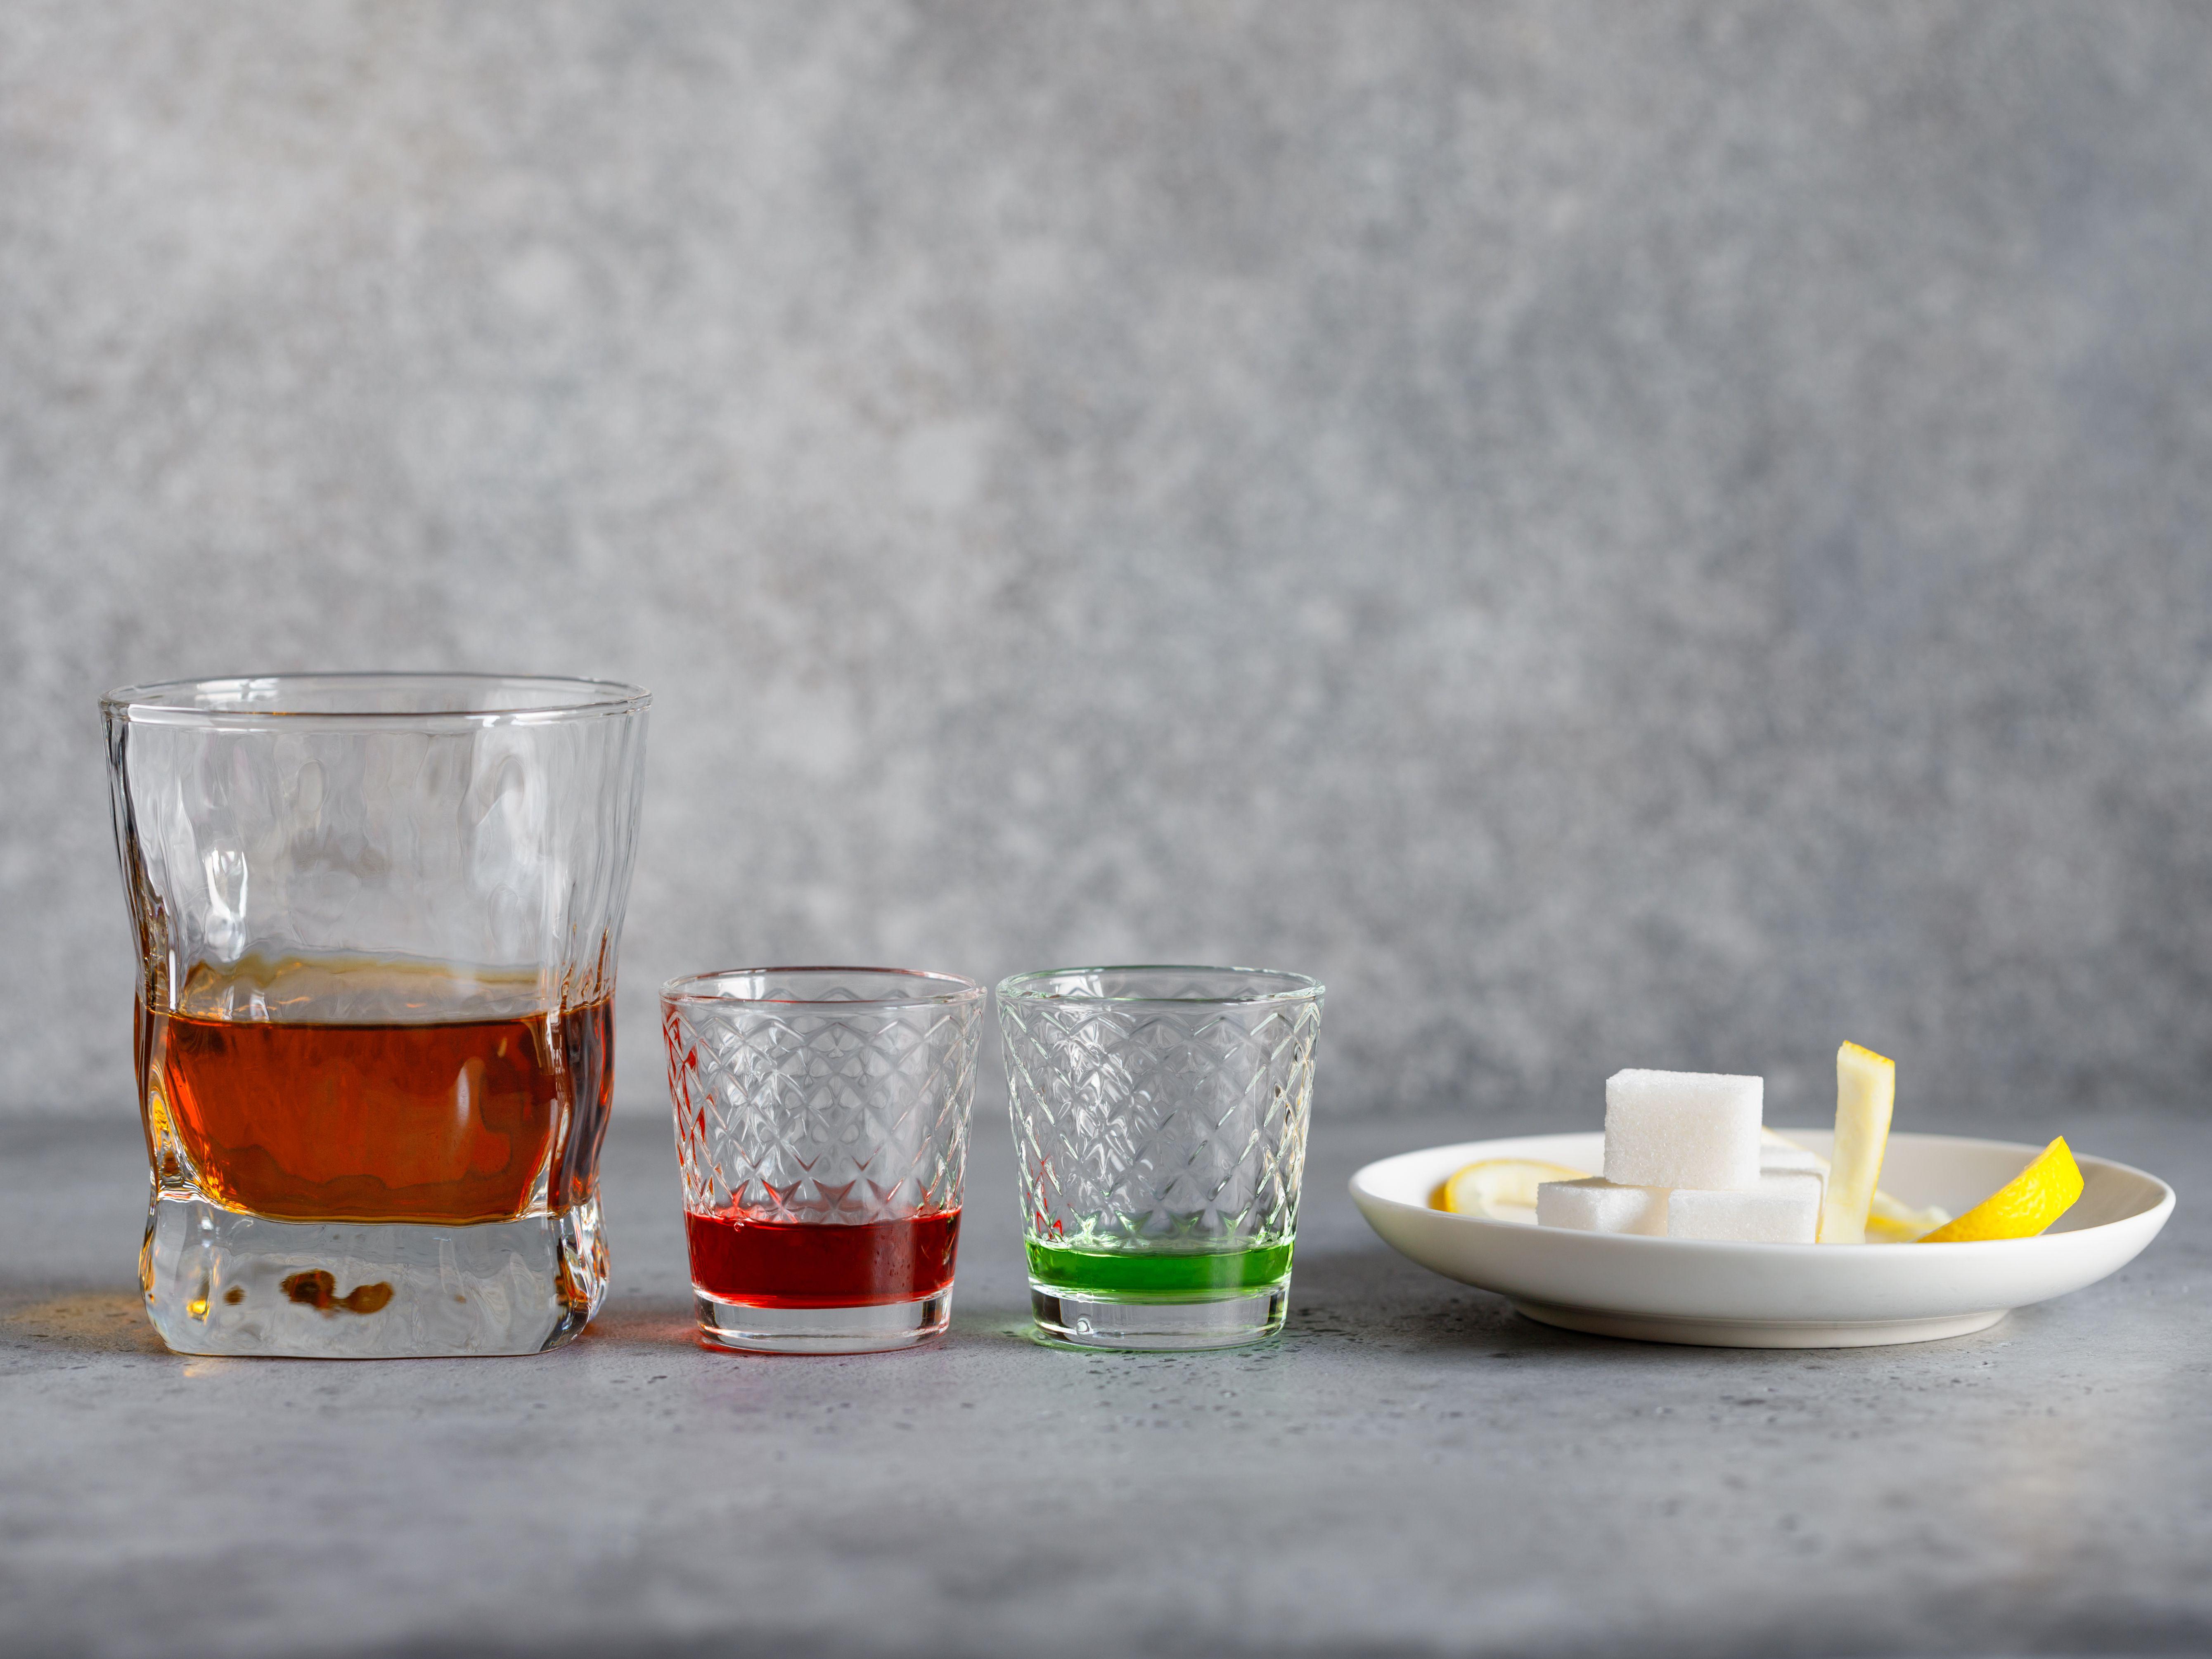 Ingredients for making a sazerac cocktail